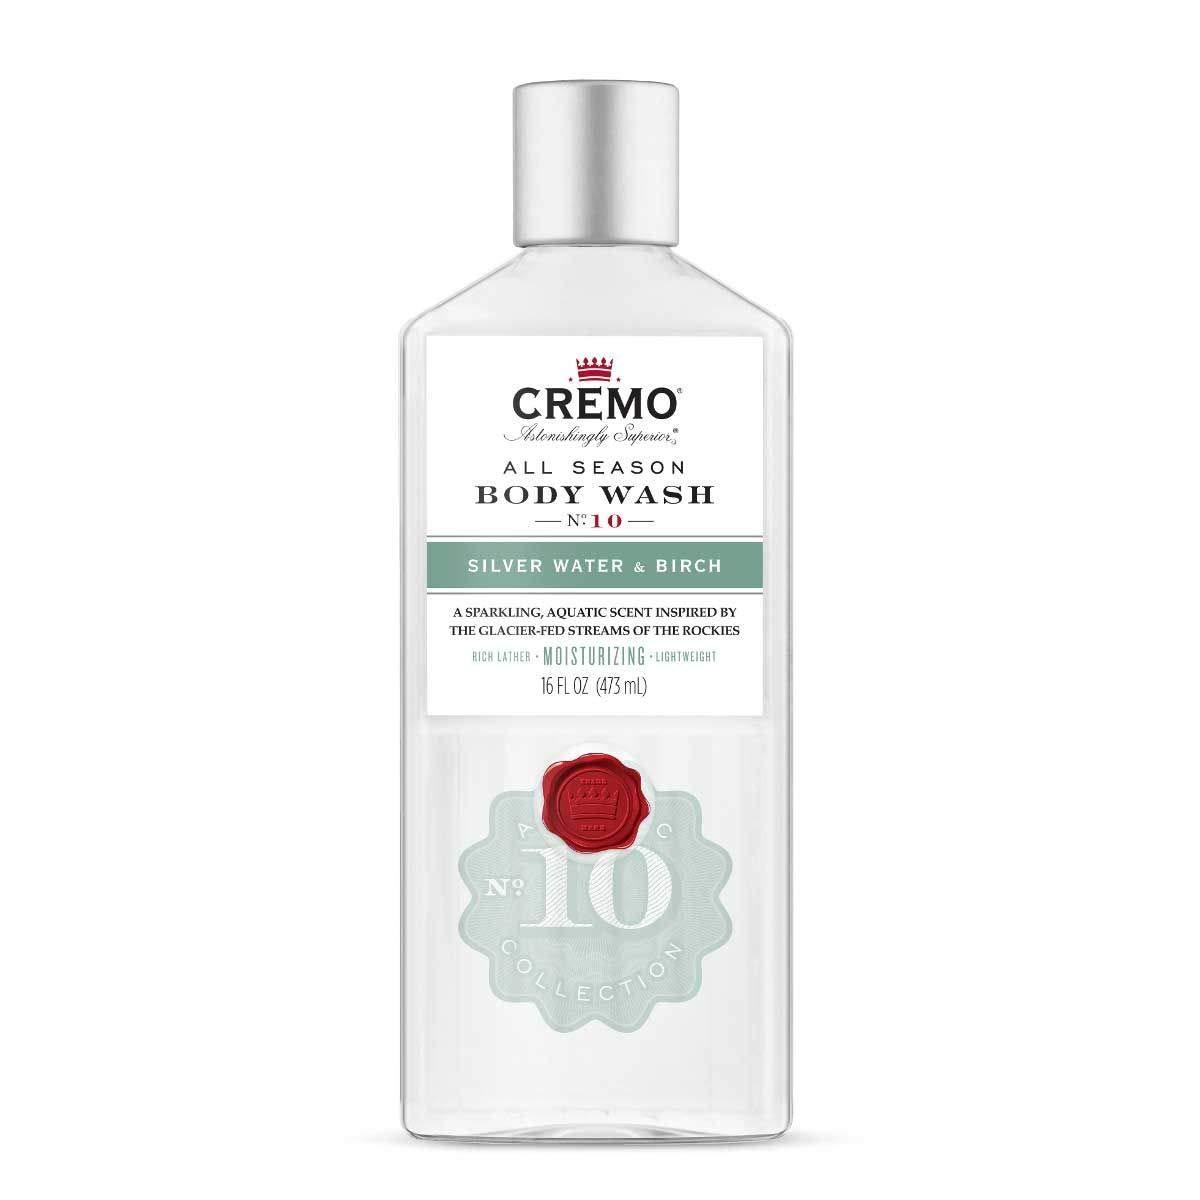 Cremo All Season Body Wash, Silver Water & Birch, 16 fl oz (Pack of 2)